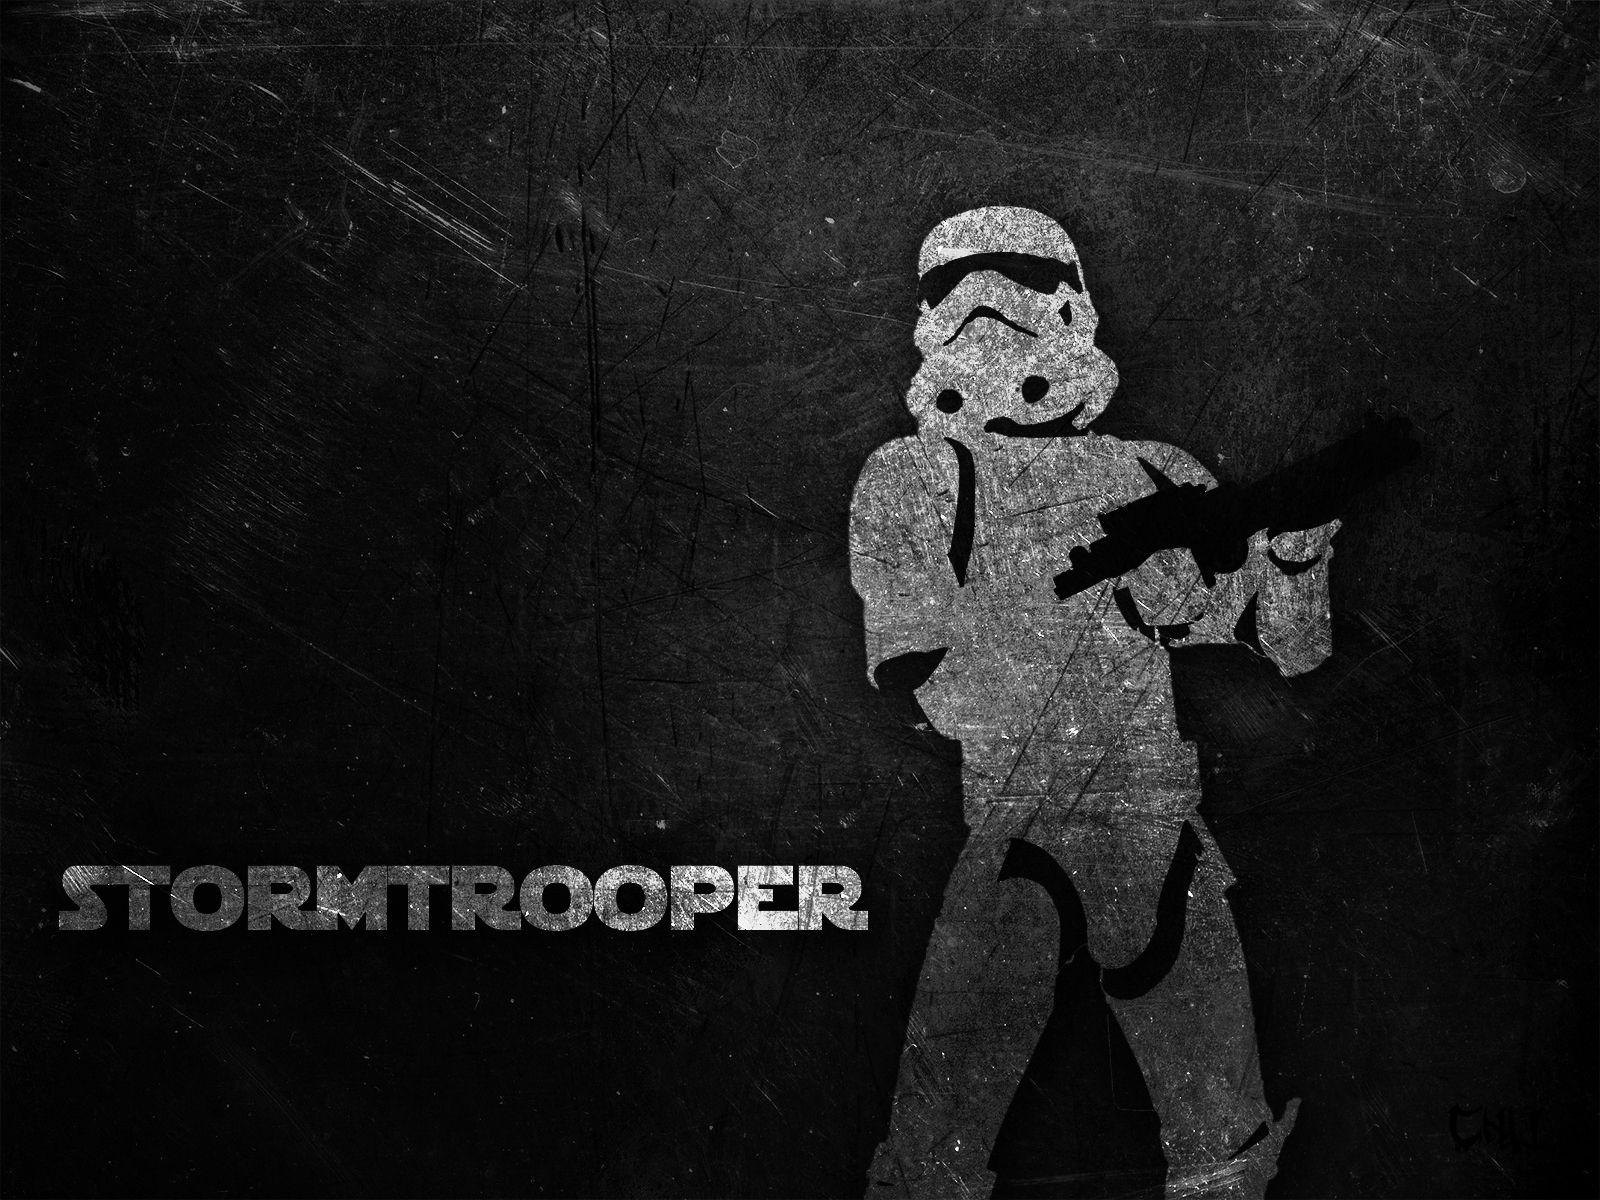 Star Wars Stormtrooper Wallpapers On Wallpaperdog